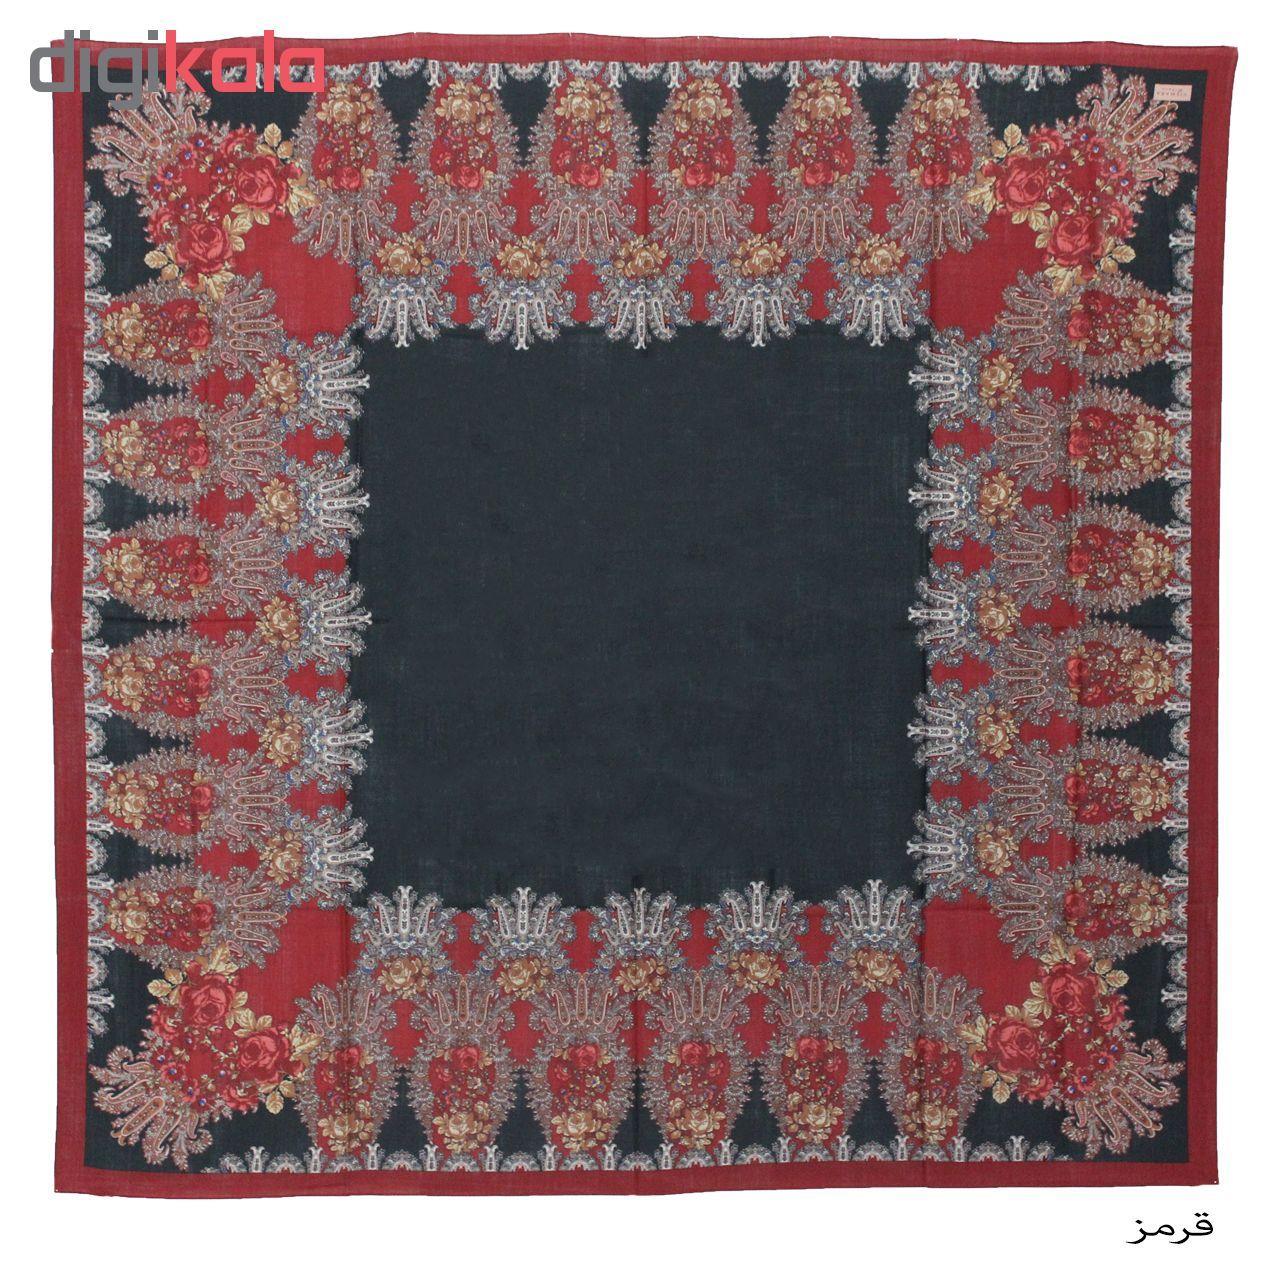 روسری زنانه برند ویسمارا مدل ملکه کد ۰۰۱۰ main 1 6